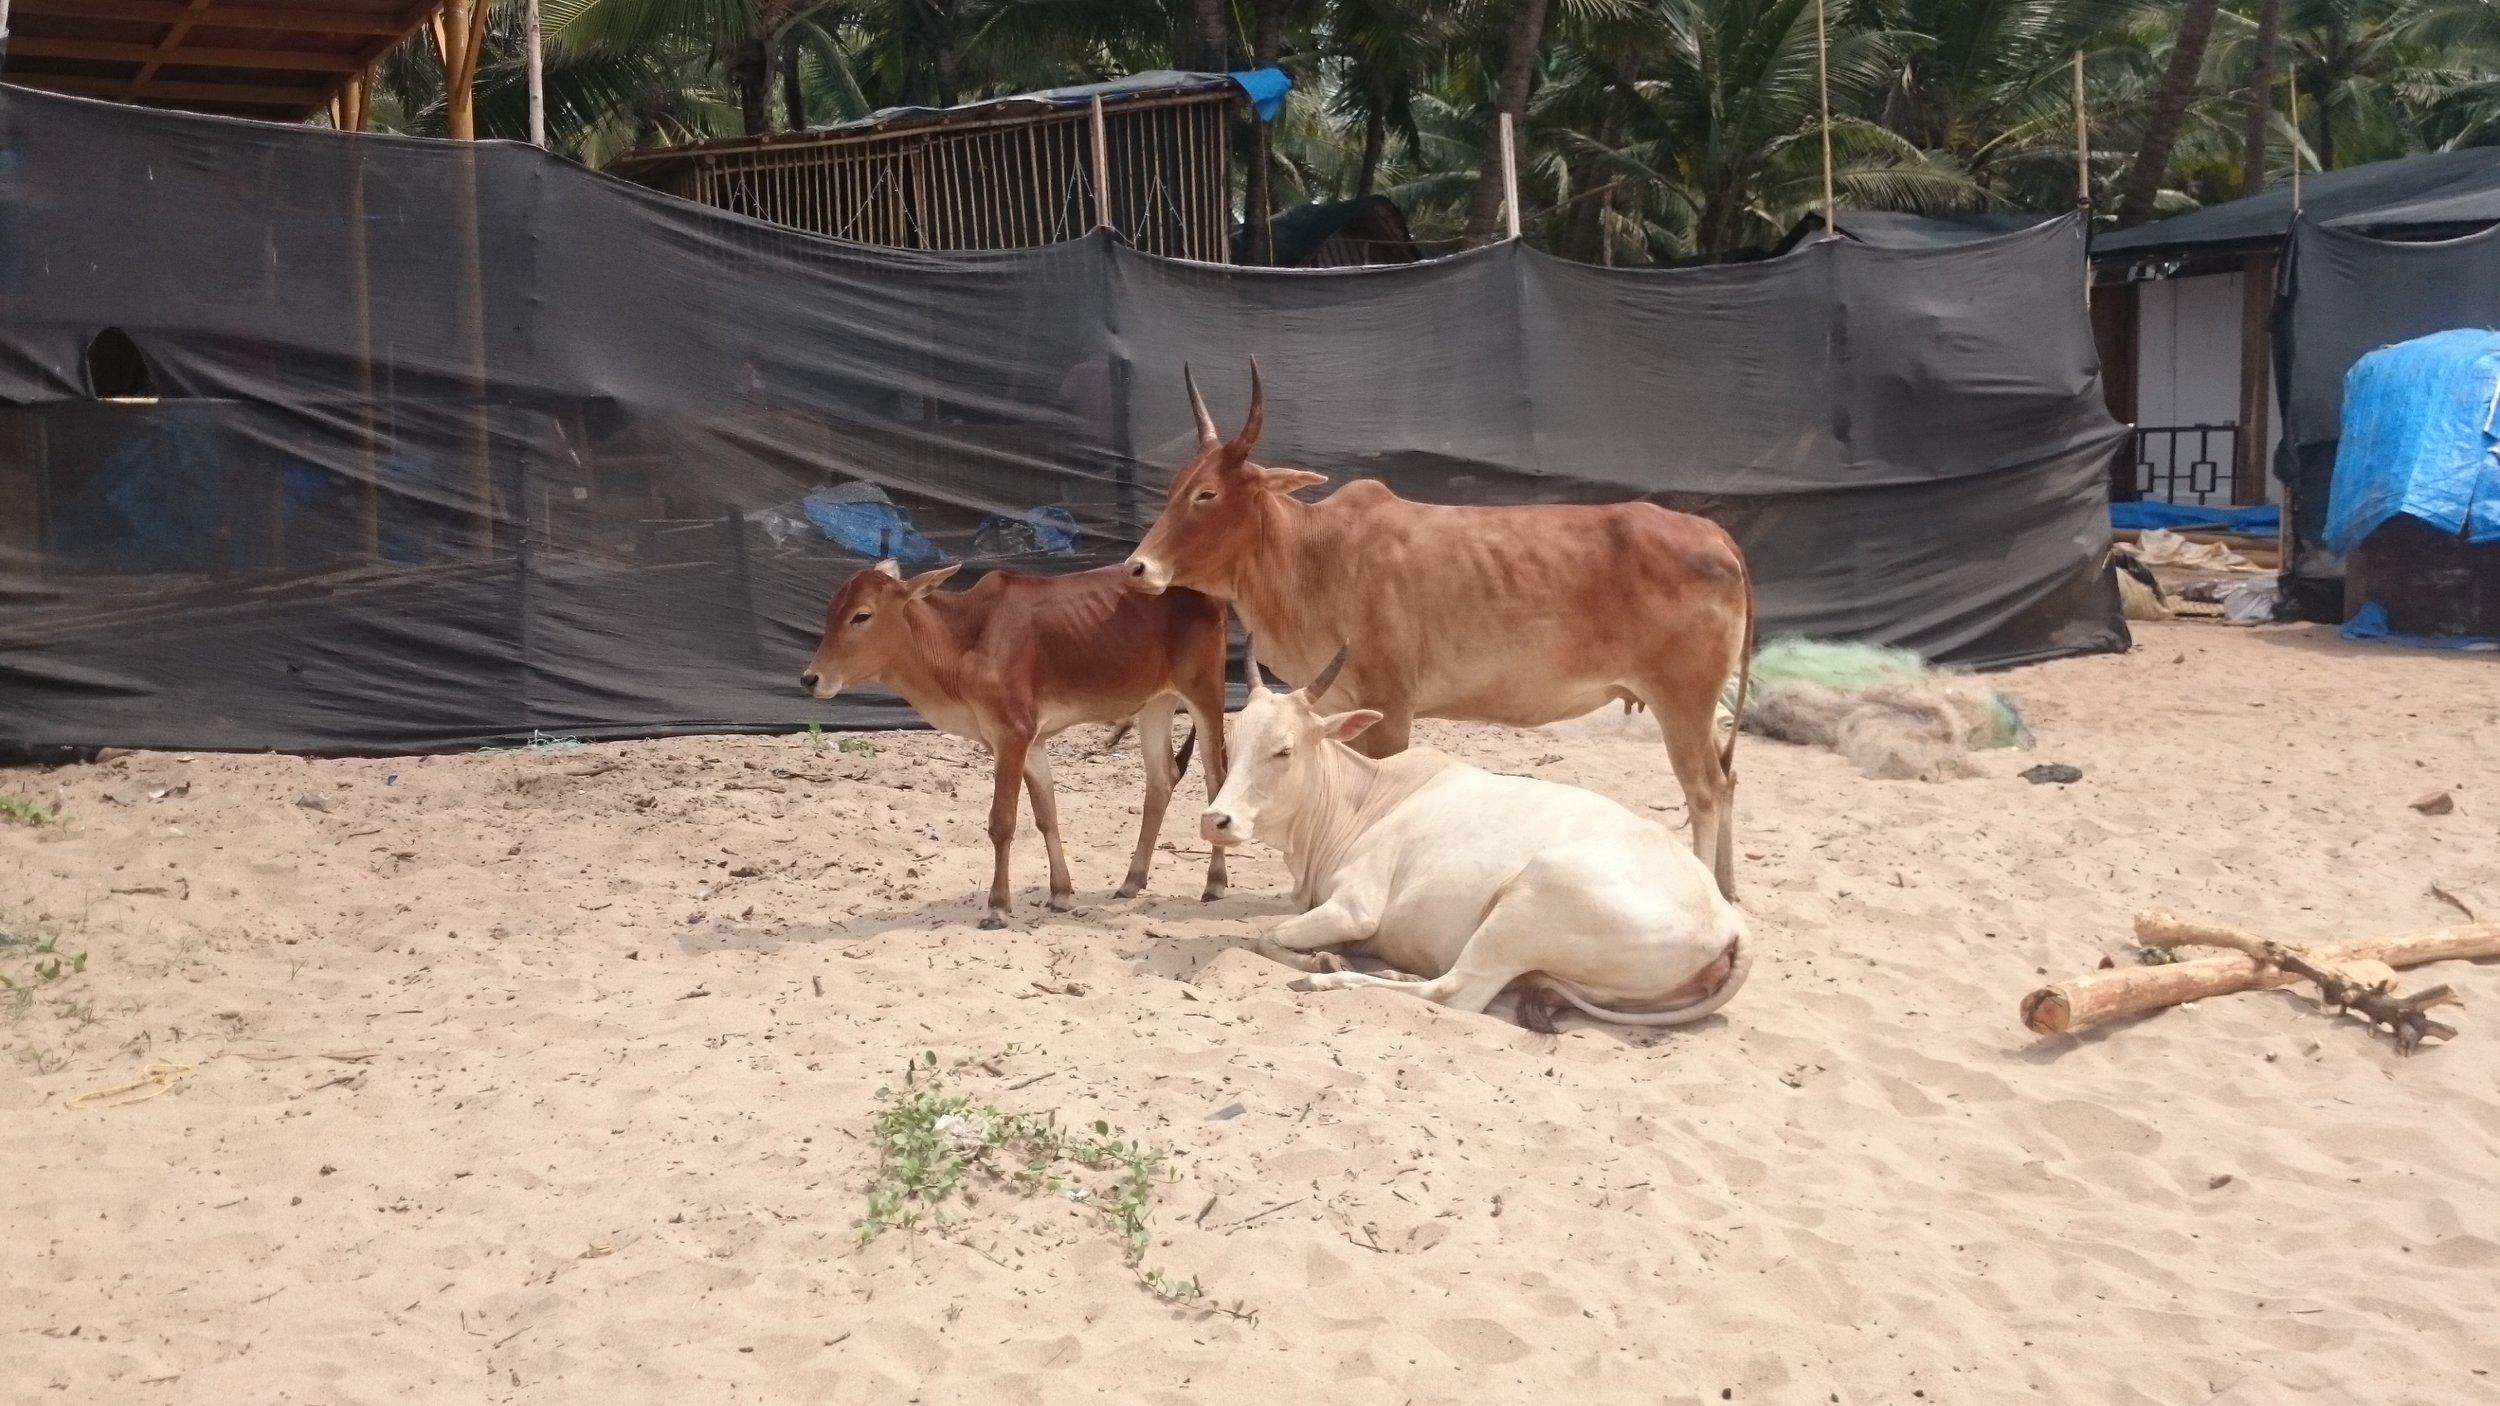 Cows on the beach in Palolem, Goa.